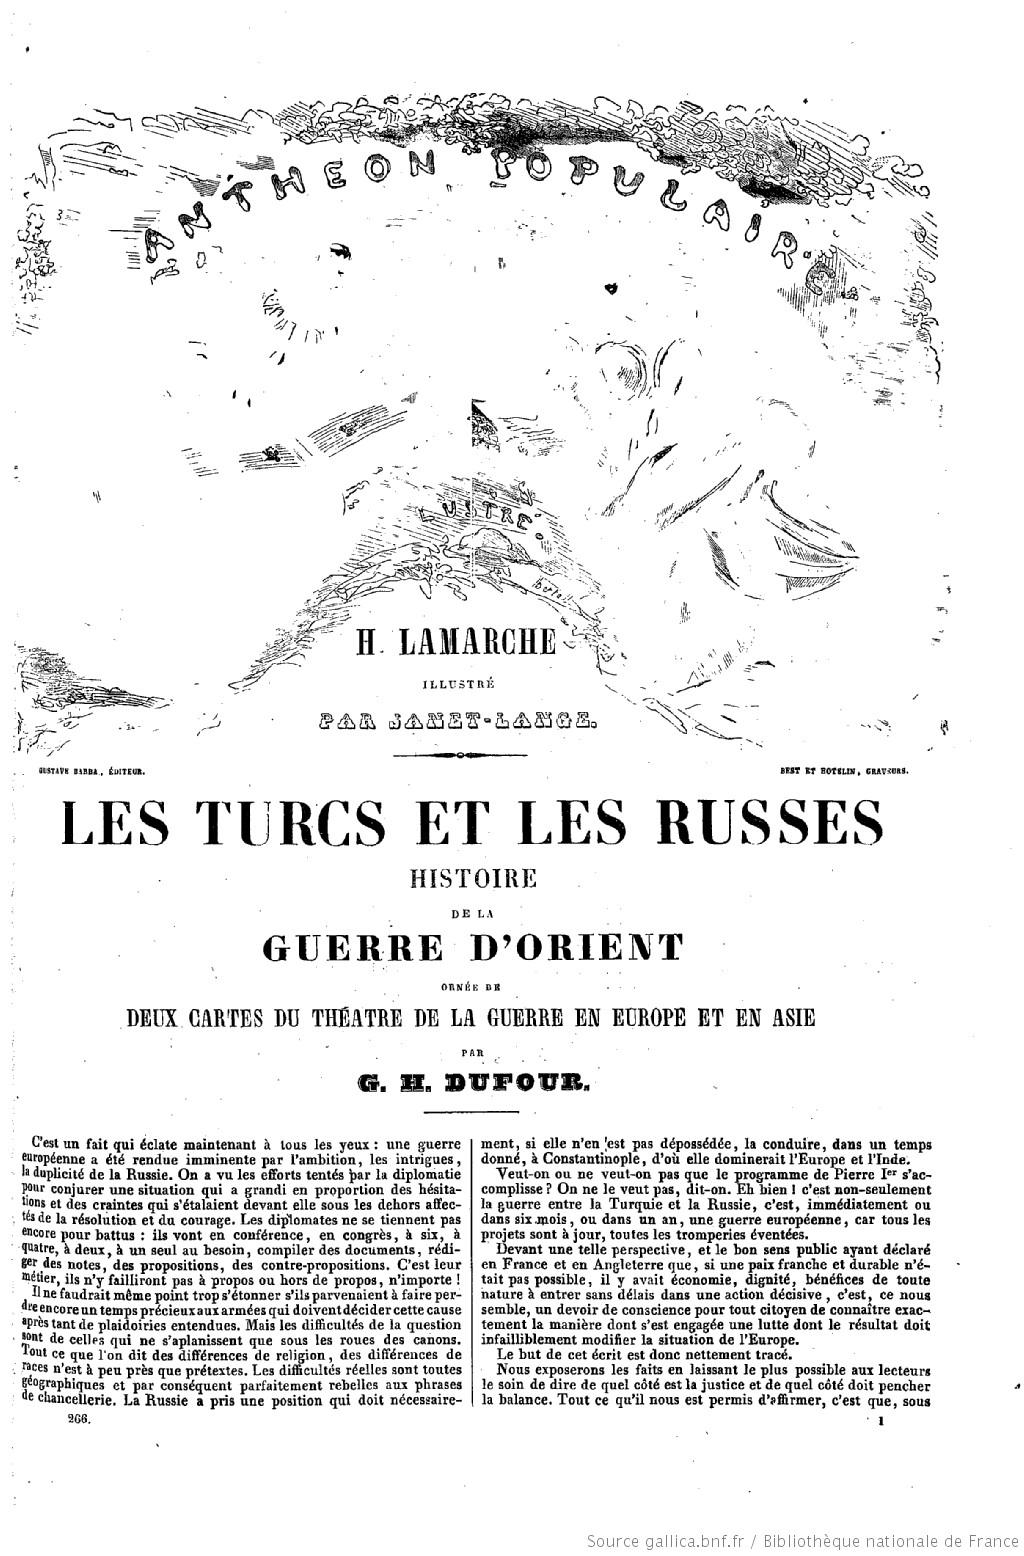 http://gallica.bnf.fr/ark:/12148/bpt6k6183651z/f1.highres